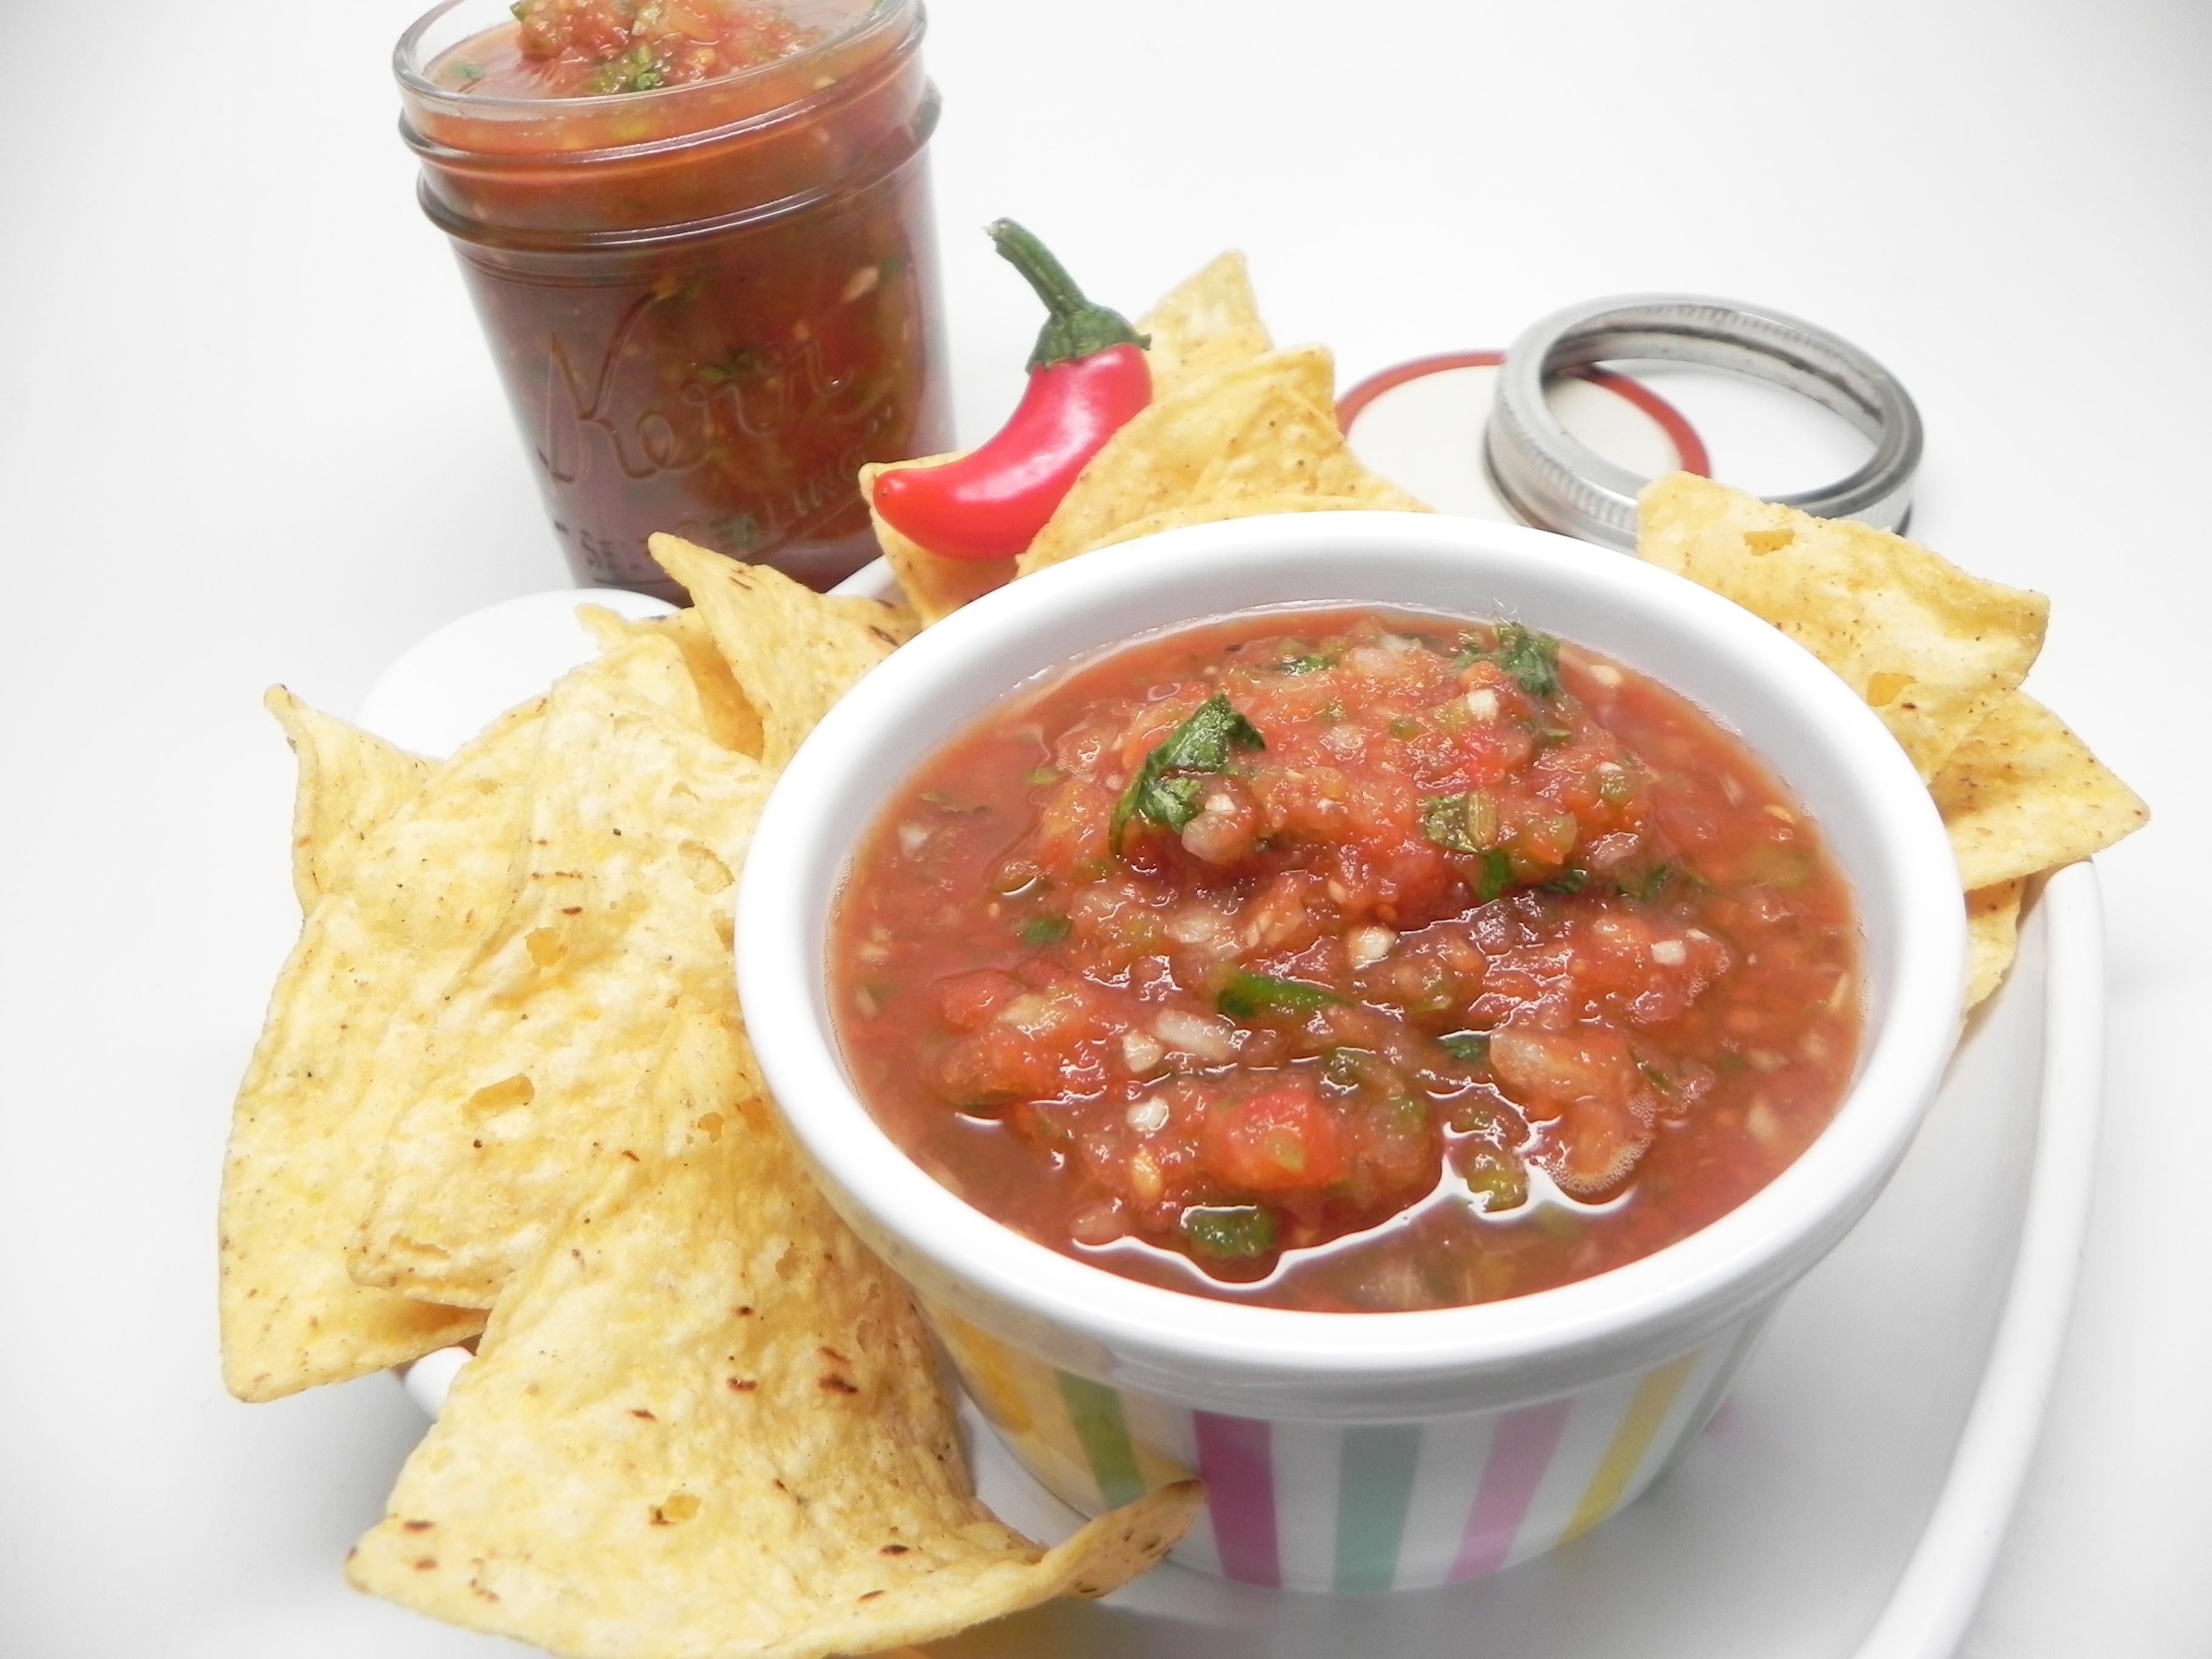 Homemade Hot Sauce with Jalapenos